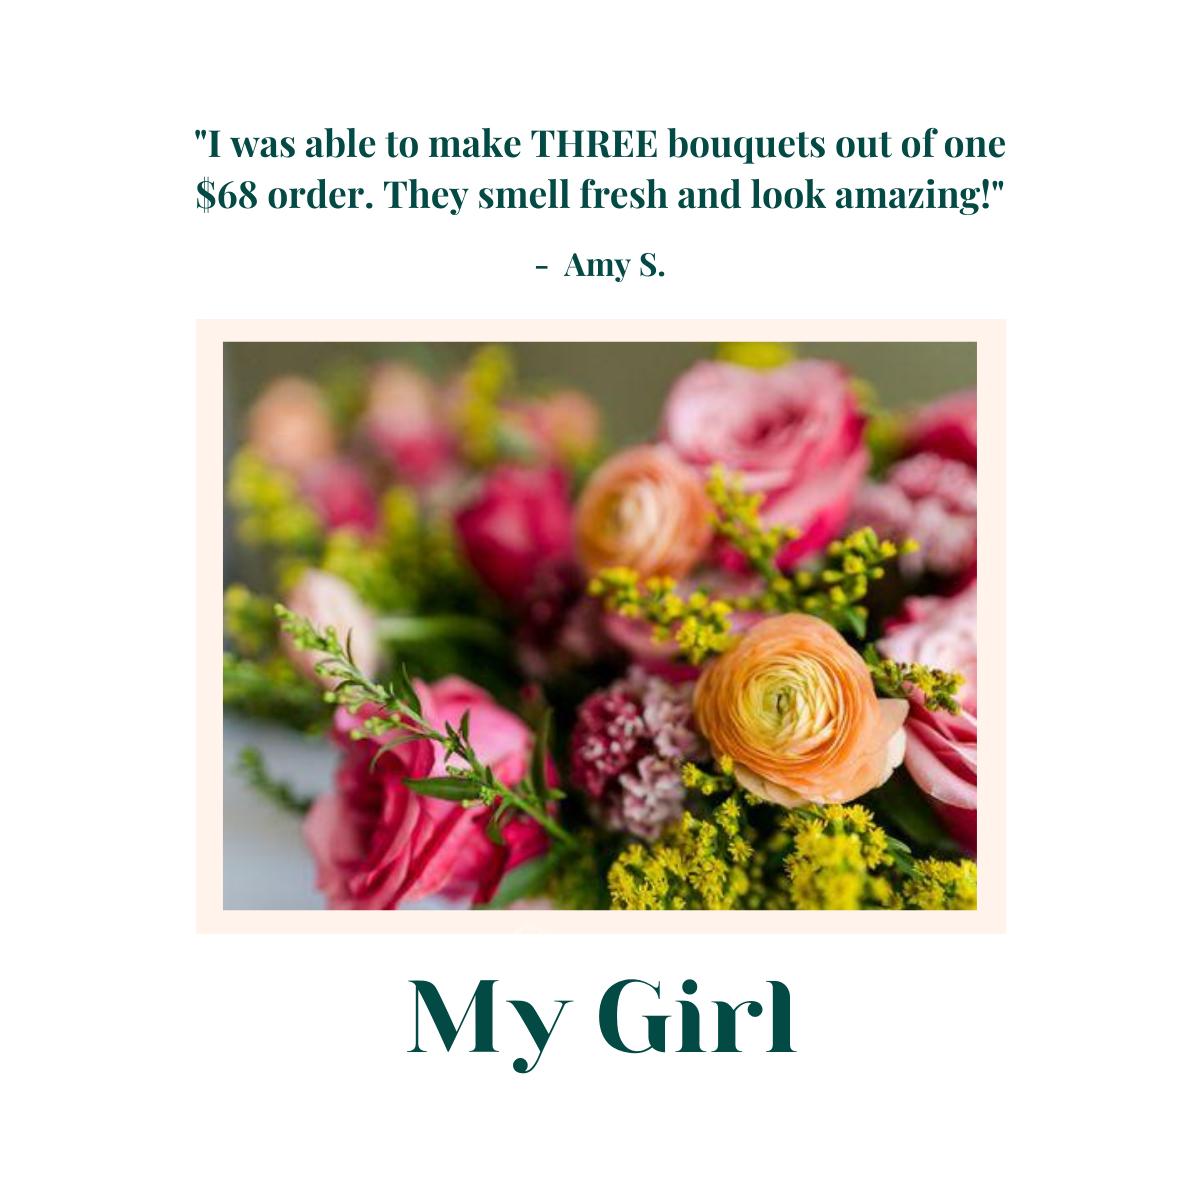 https://www.yourpoppy.com/product/my-girl